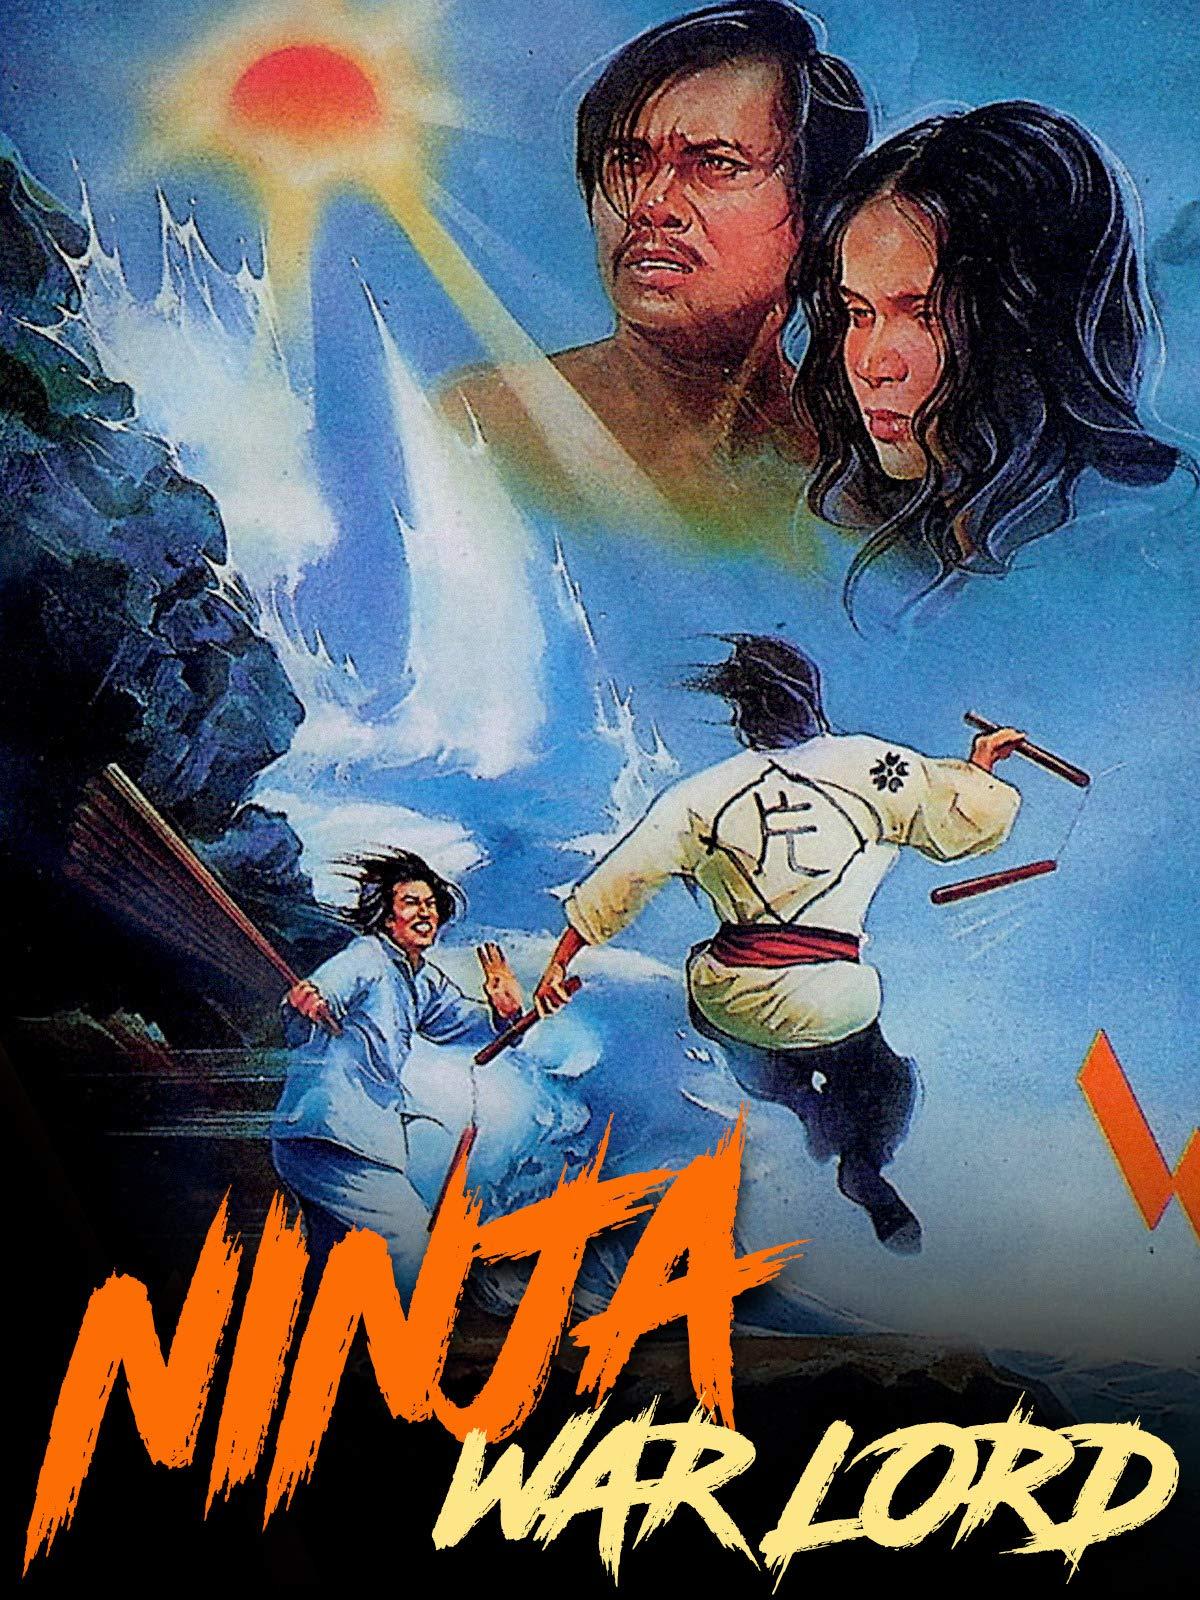 Watch Ninja War Lord 1973 | Prime Video